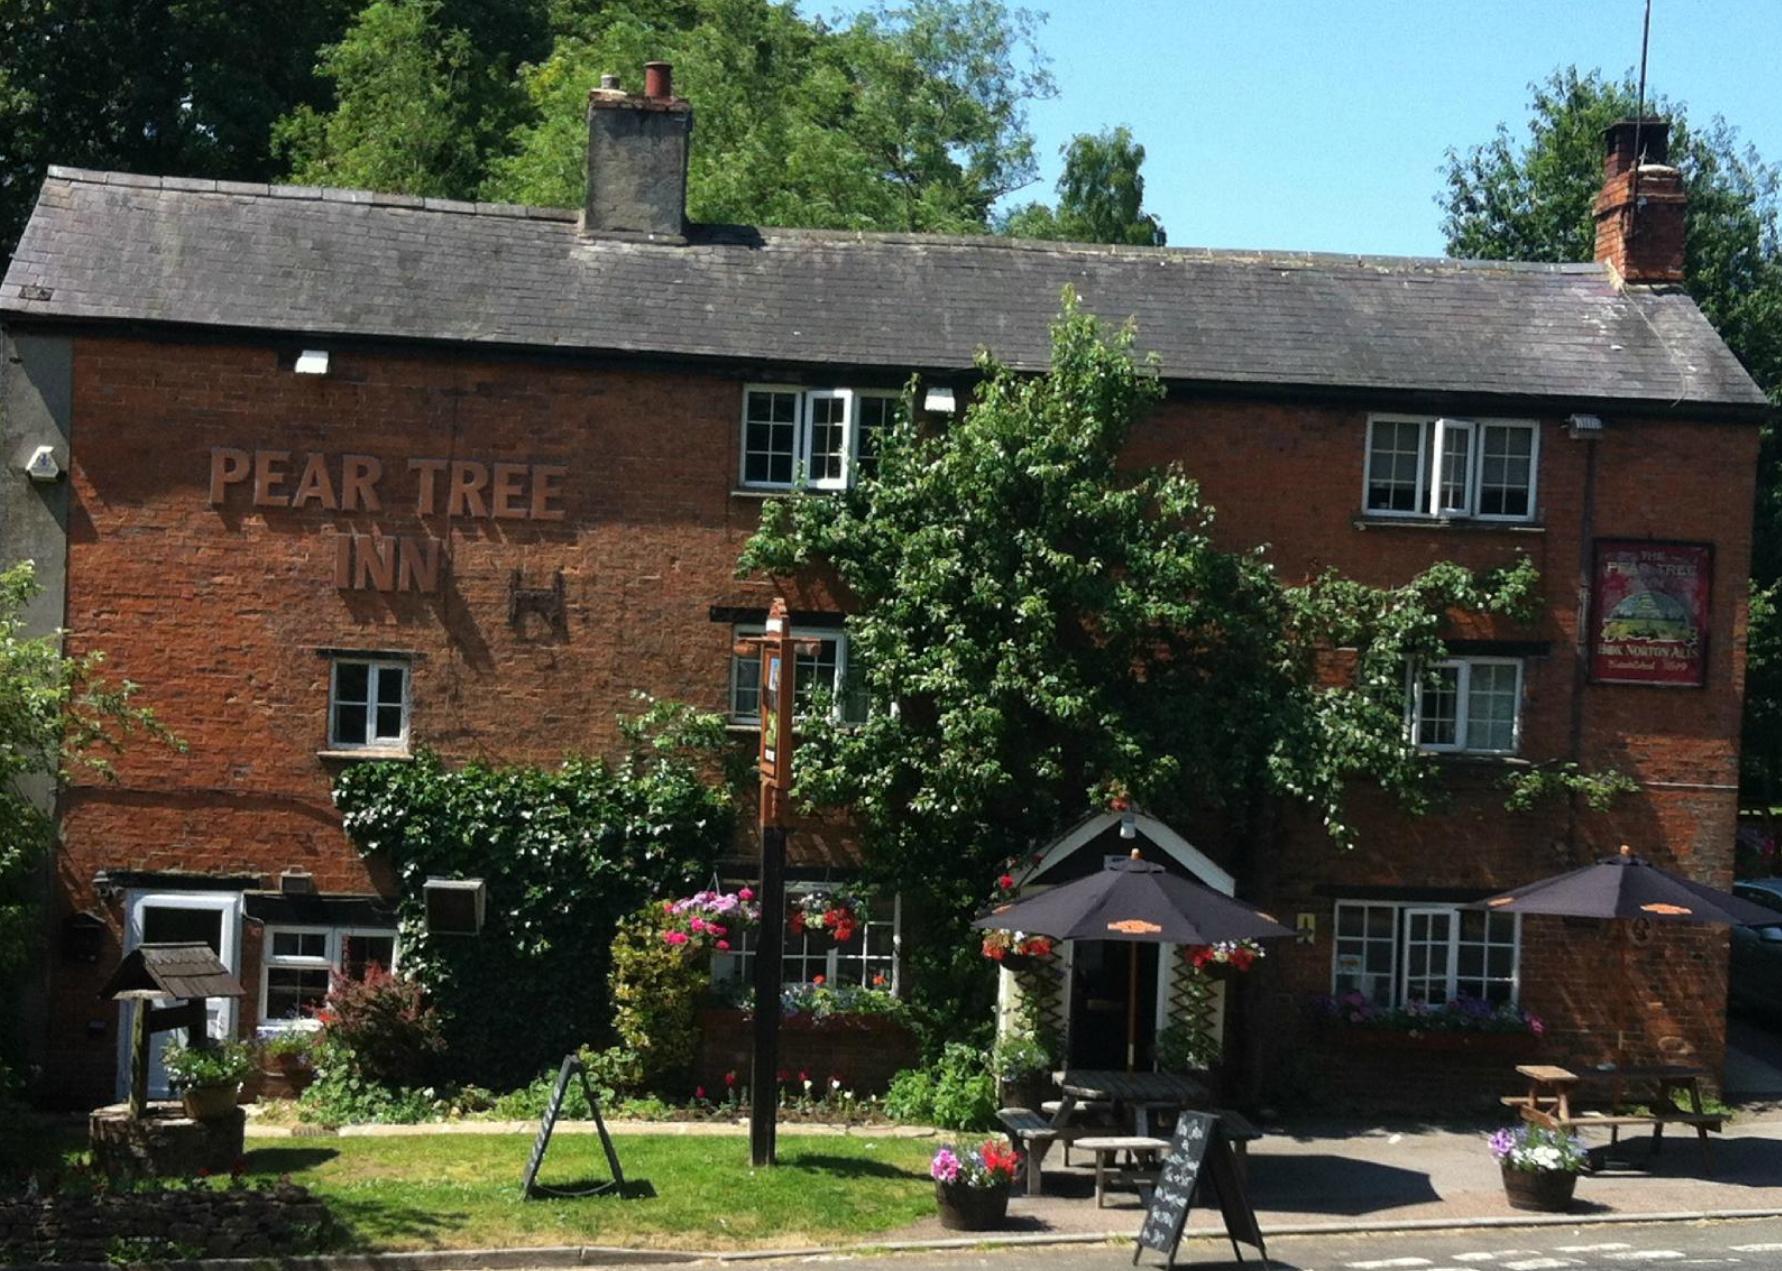 Pear Tree Inn front entrance